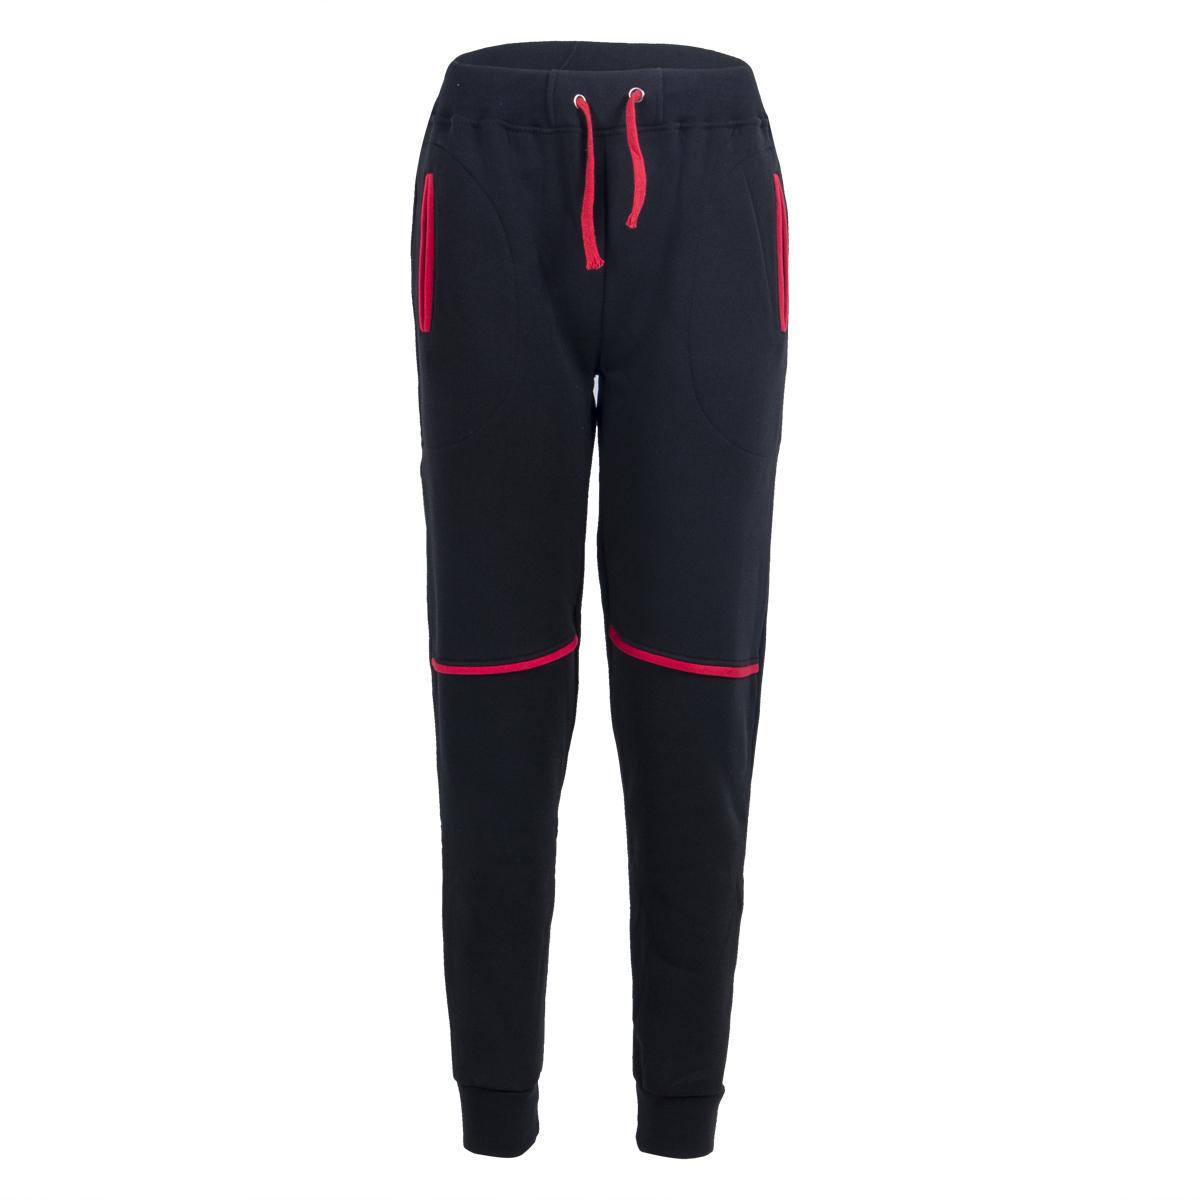 Hirigin Mens Joggers Autumn Fashion Jogginghose Street Fitness Trainingshose Trainings-Kleidung für Männer 2018 beiläufige Bleistift Jogger